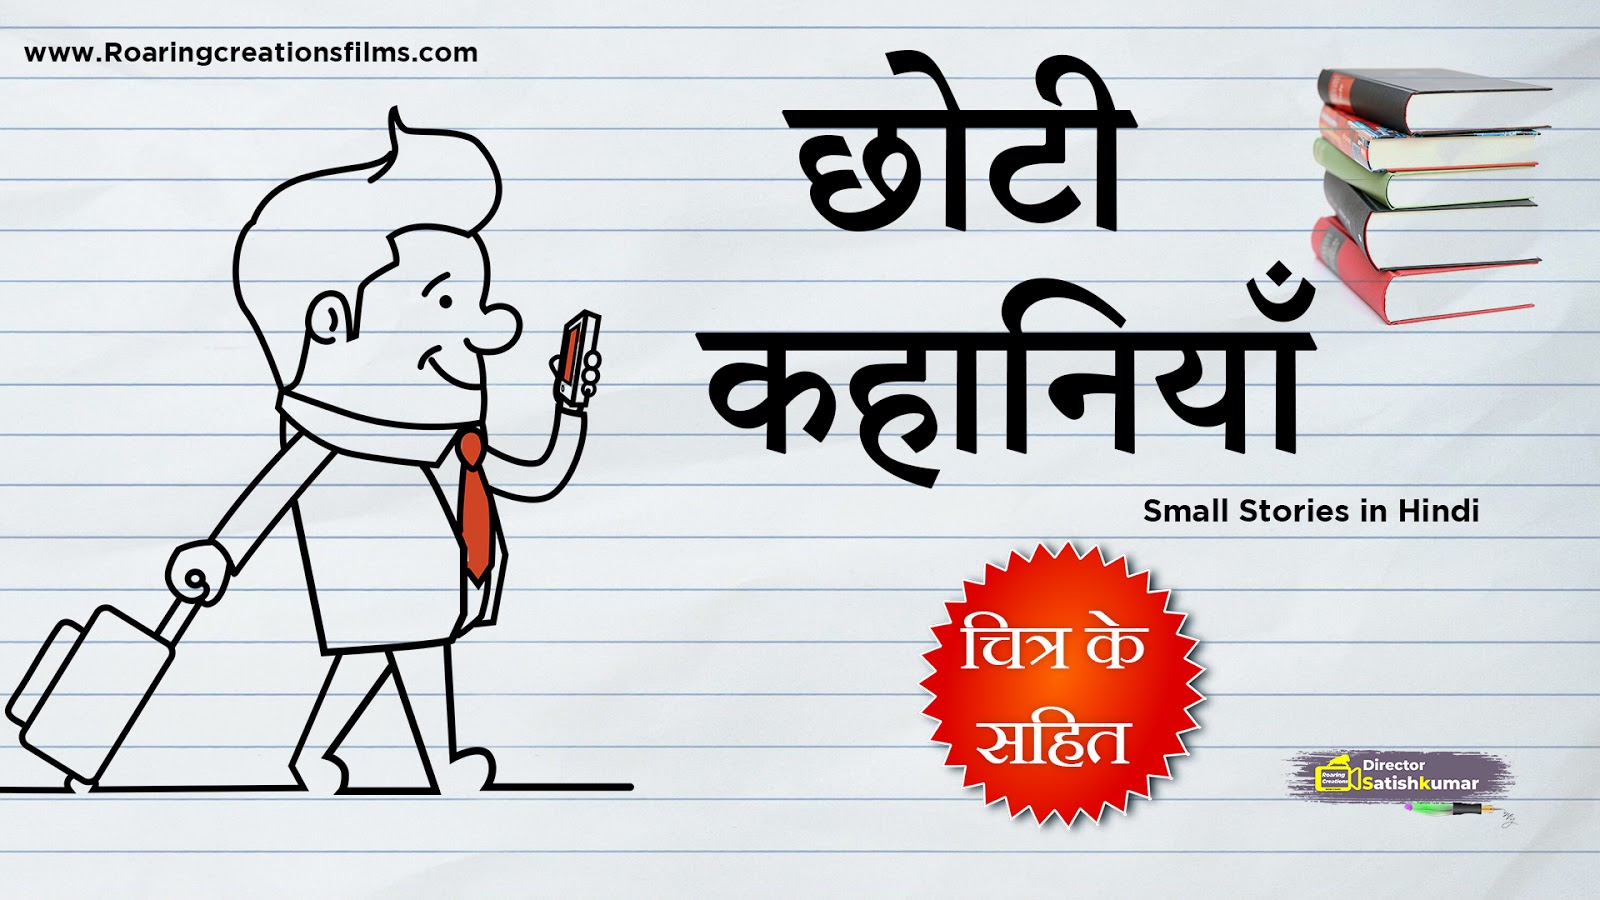 छोटी कहानियाँ - Small Stories in Hindi - Small Story in Hindi